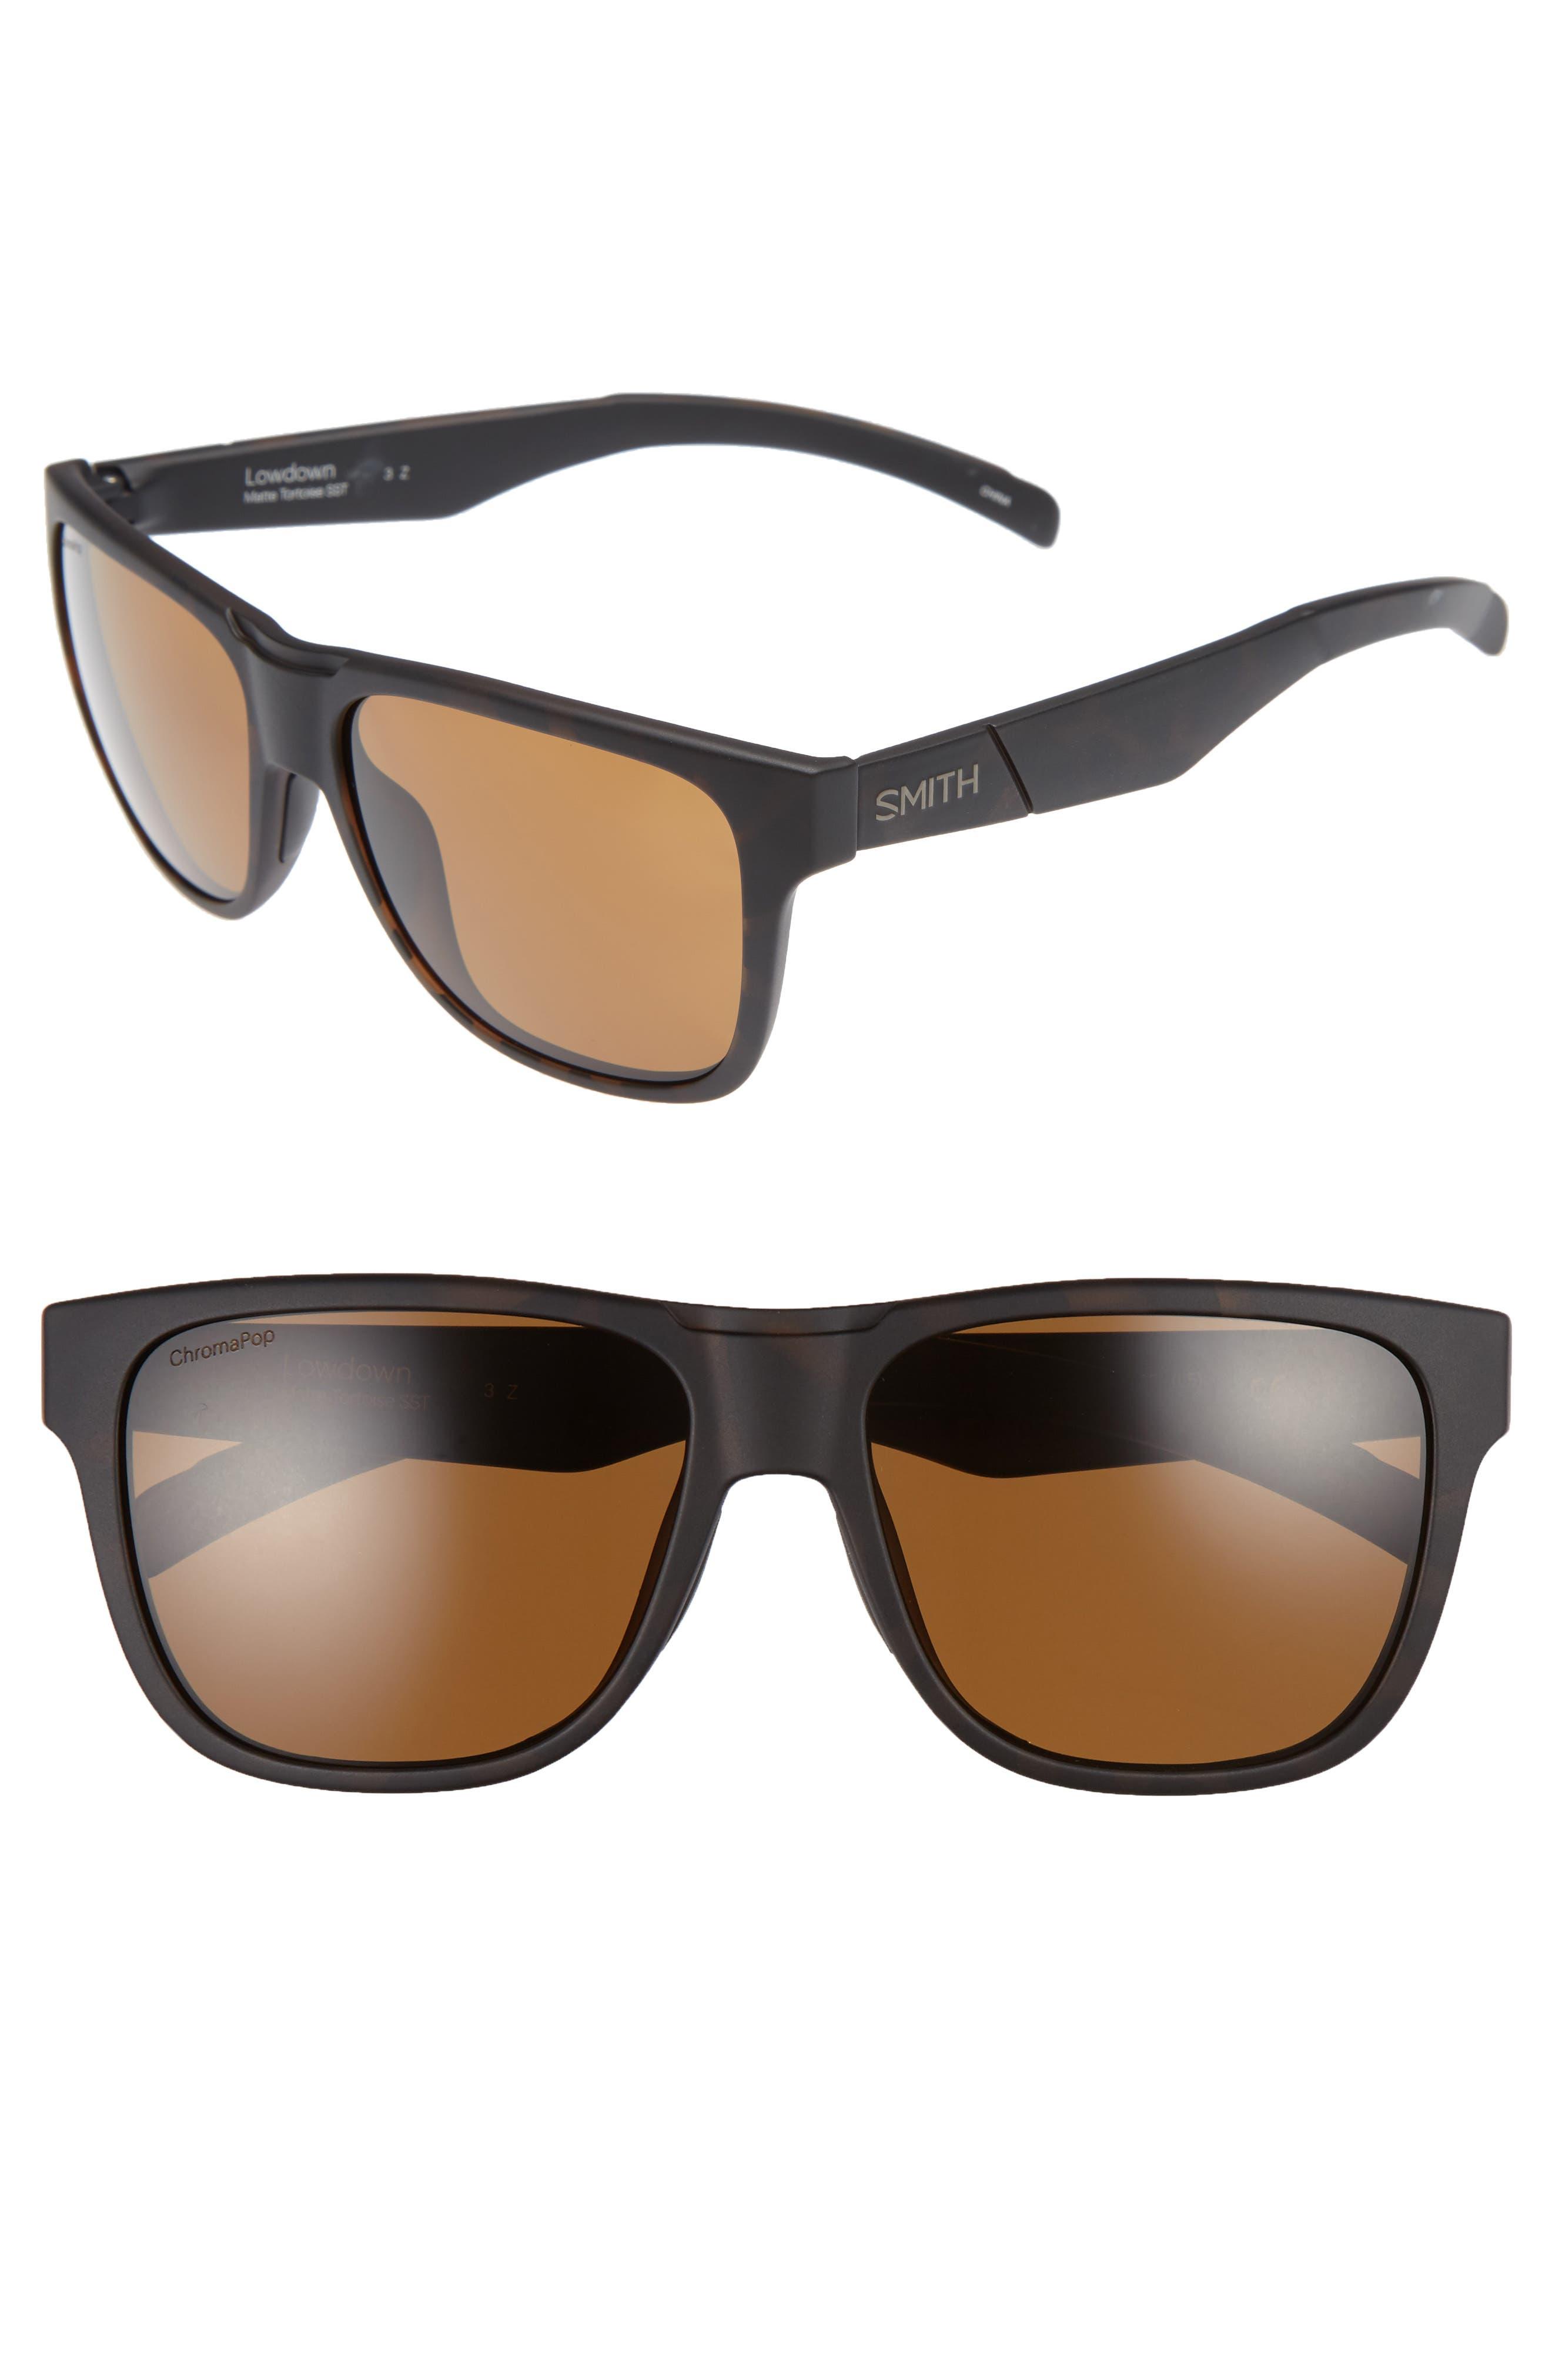 Main Image - Smith Lowdown 56mm Polarized Sunglasses